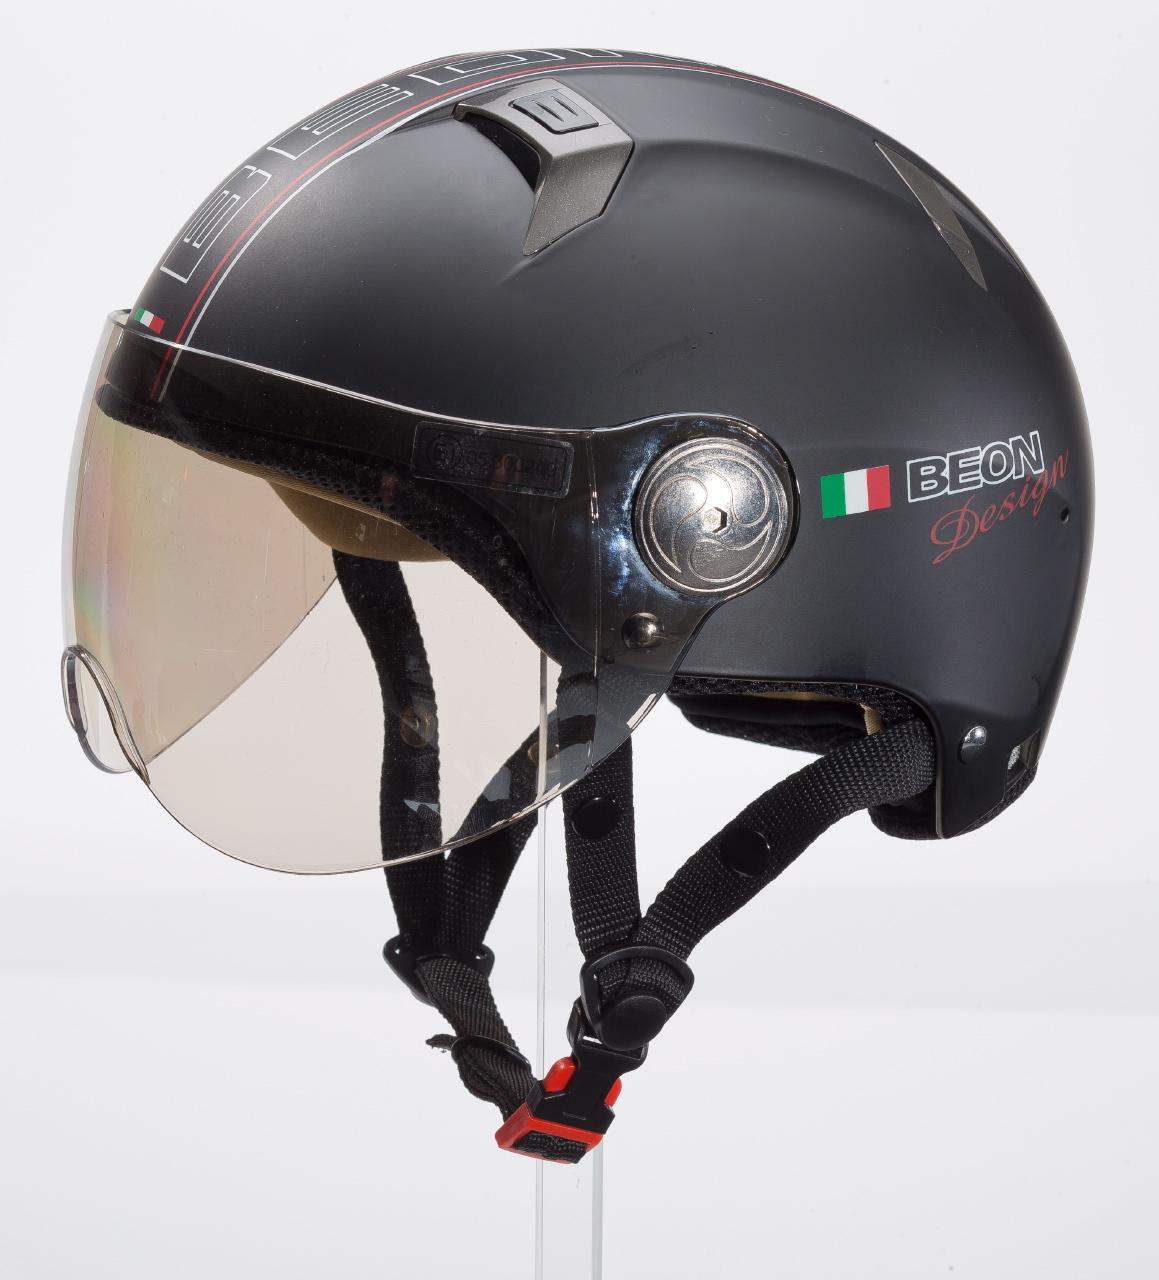 helm voor speed pedelec fietsersbond. Black Bedroom Furniture Sets. Home Design Ideas